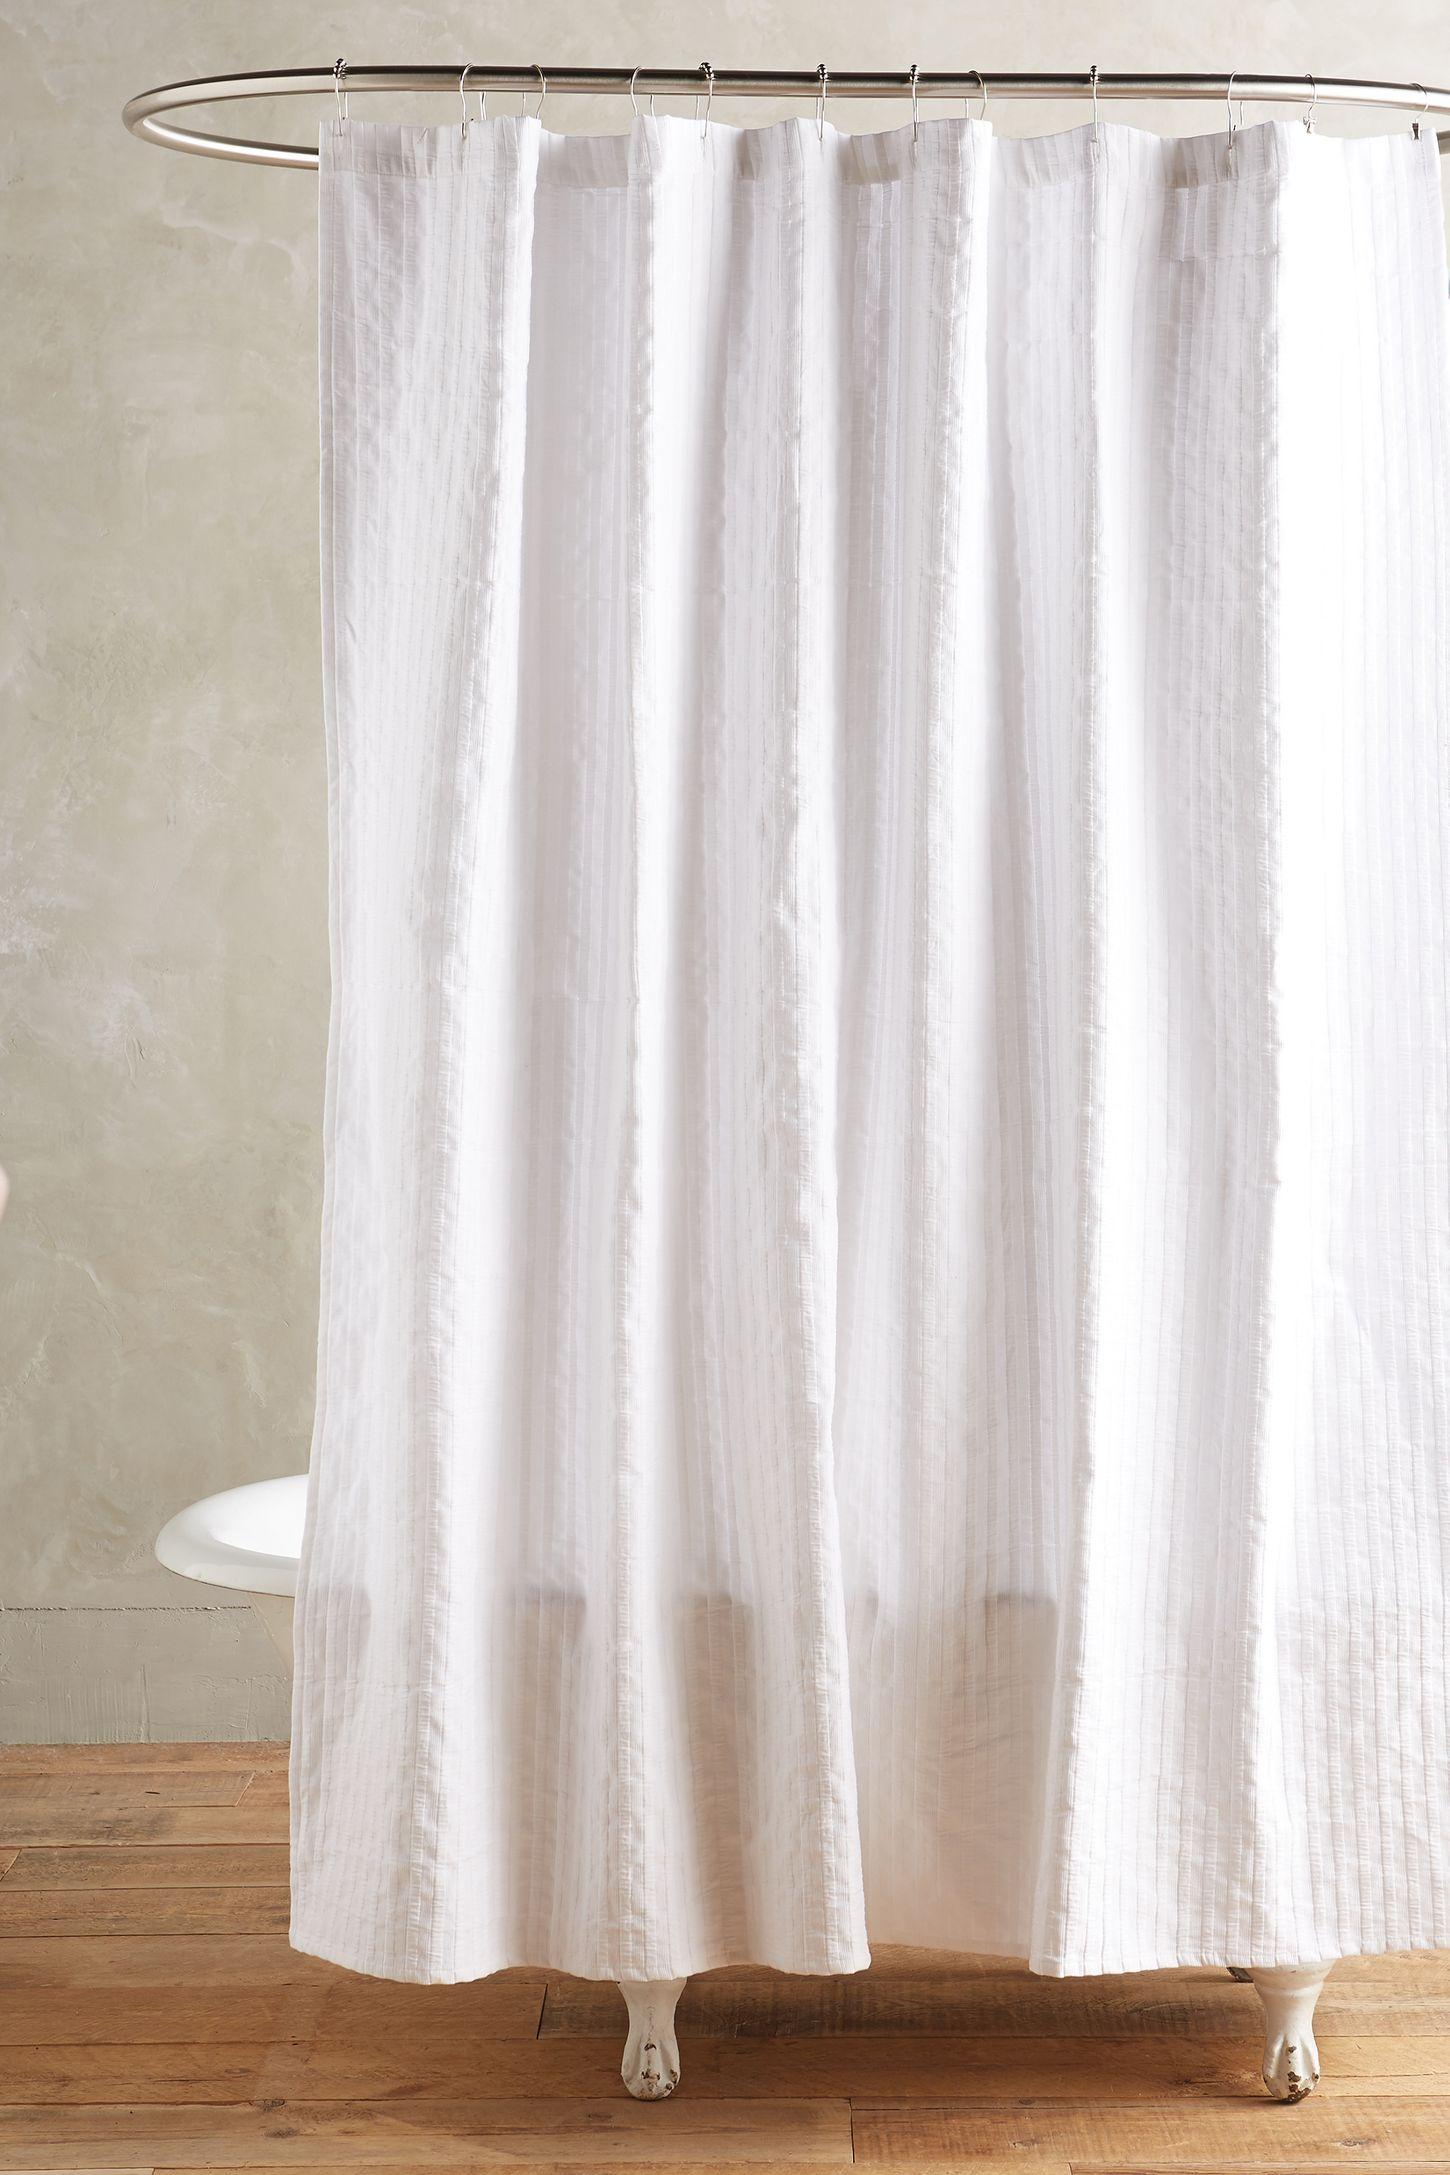 Anthropologie floral shower curtain - Anthropologie Floral Shower Curtain 49